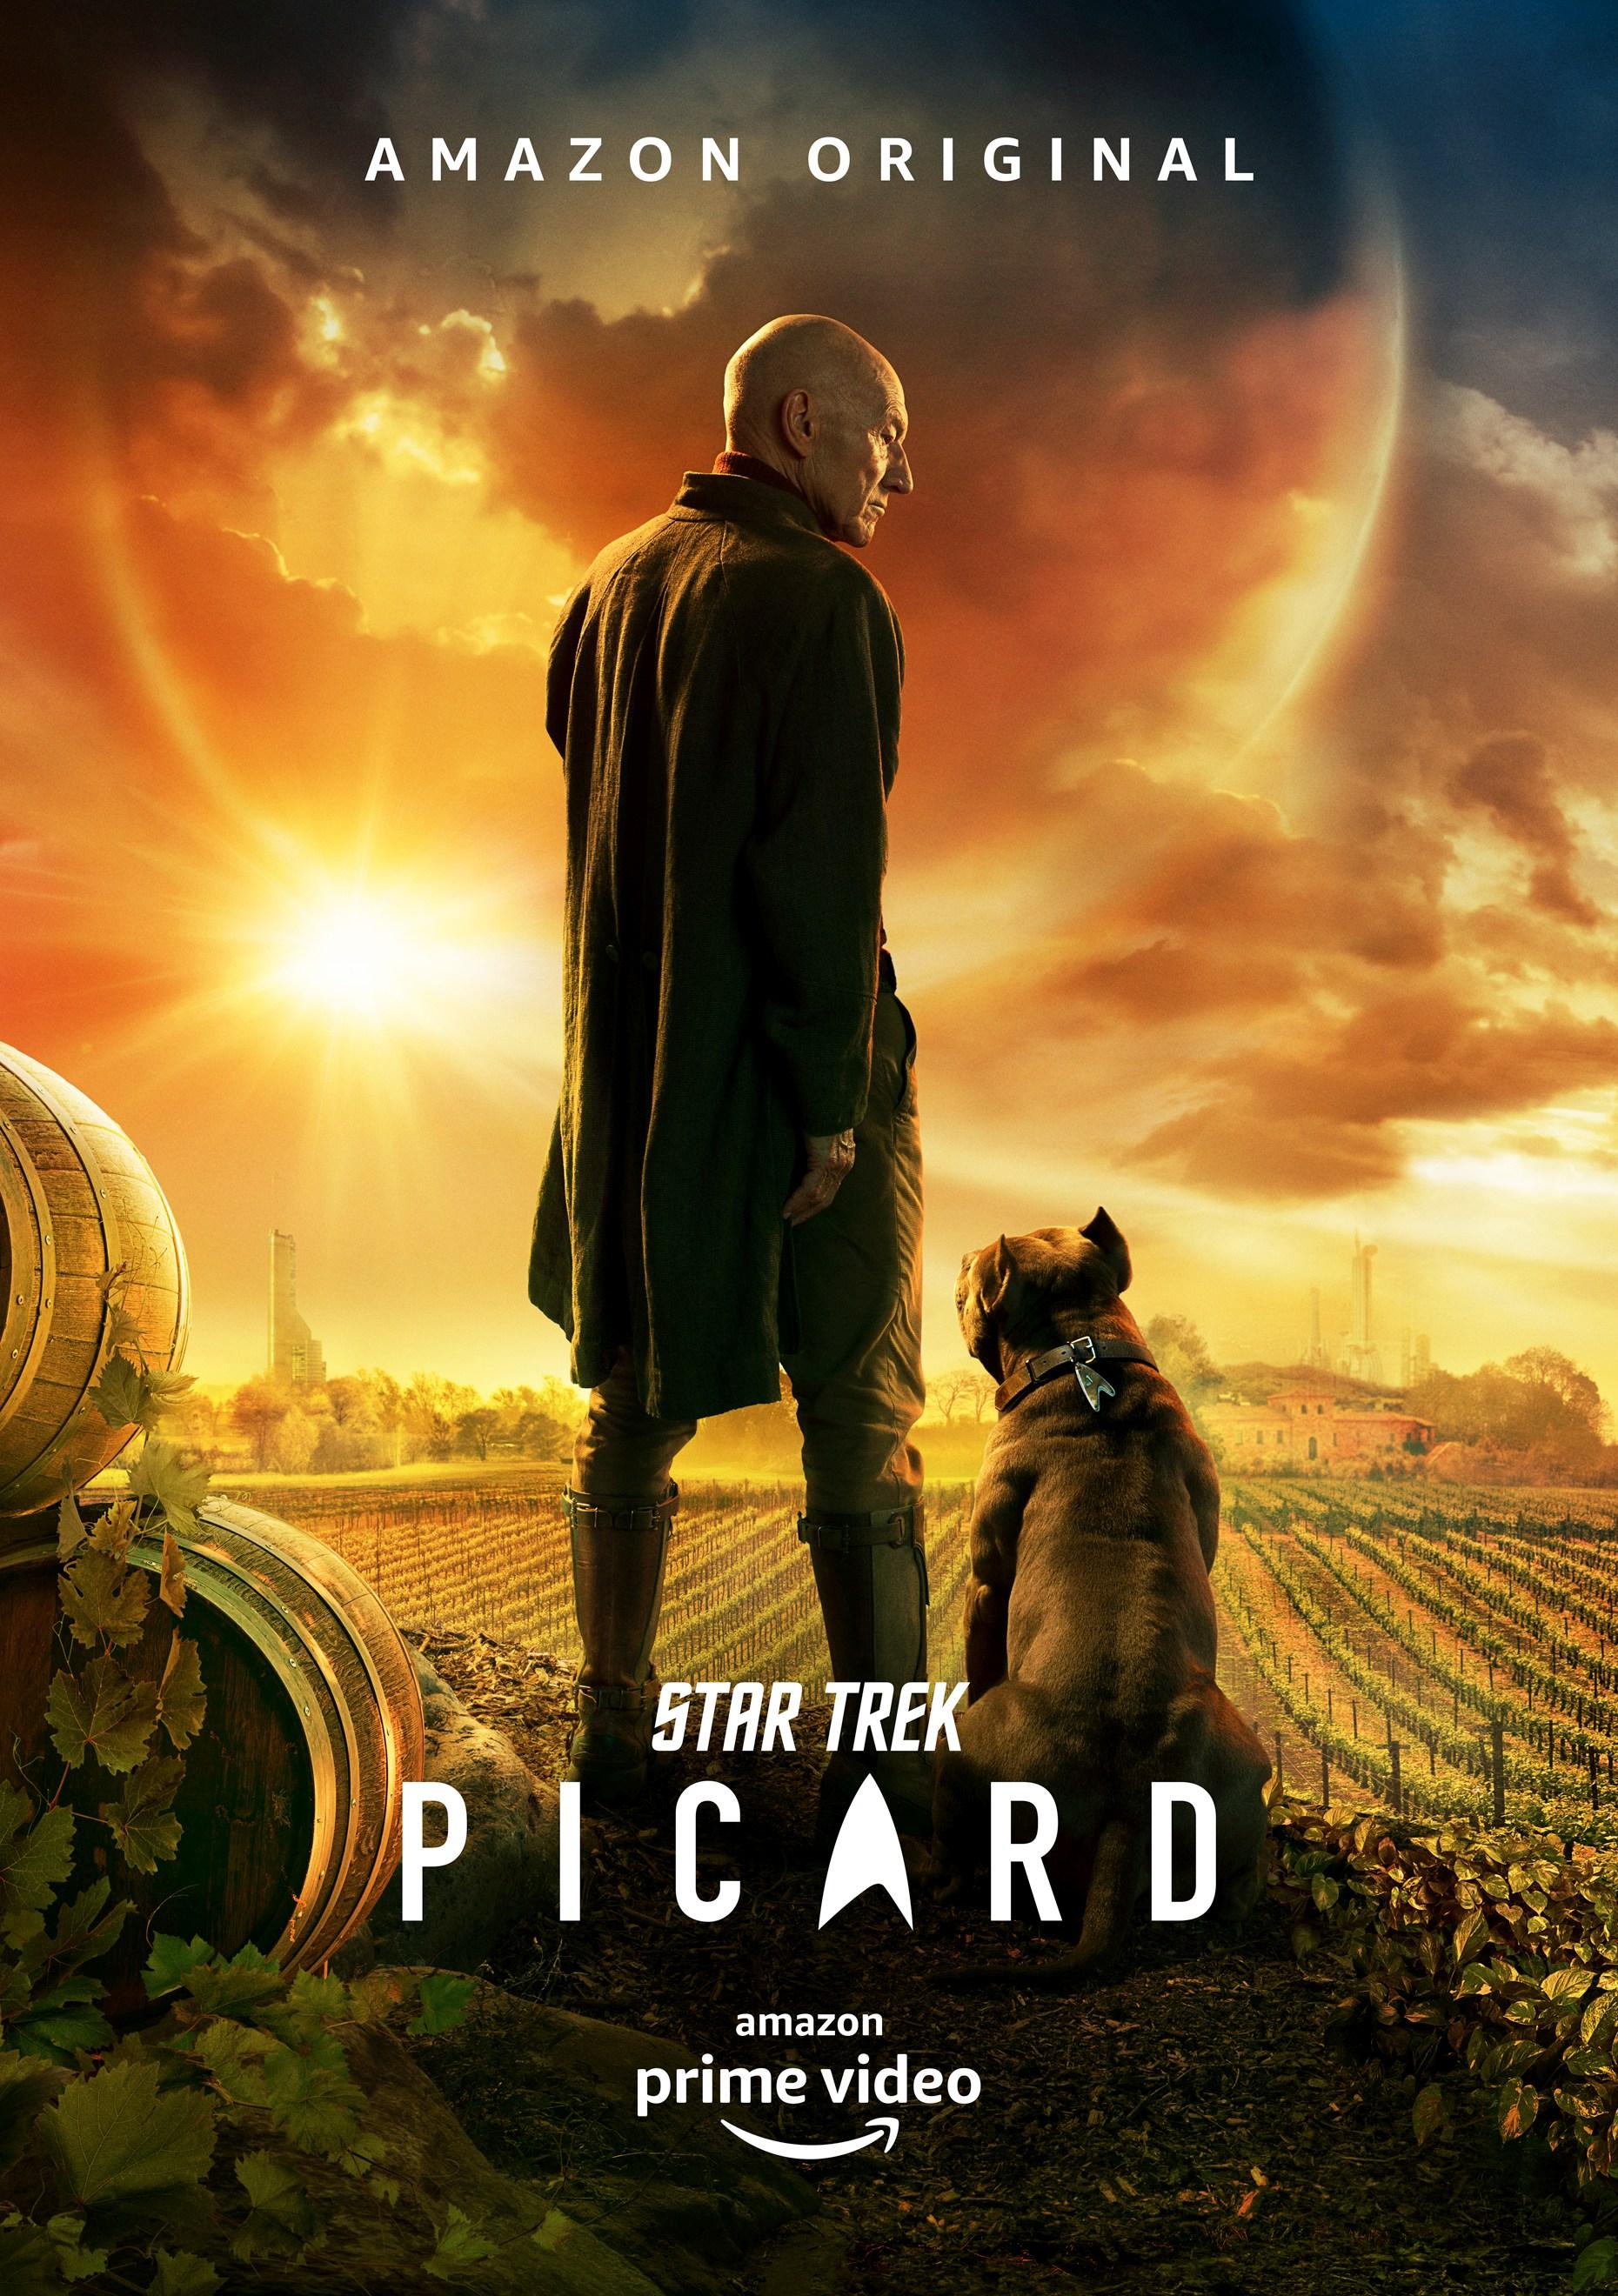 Artikel - Review Star Trek Picard - Still 12 - © 2019 Amazon.com Inc., or its affiliates